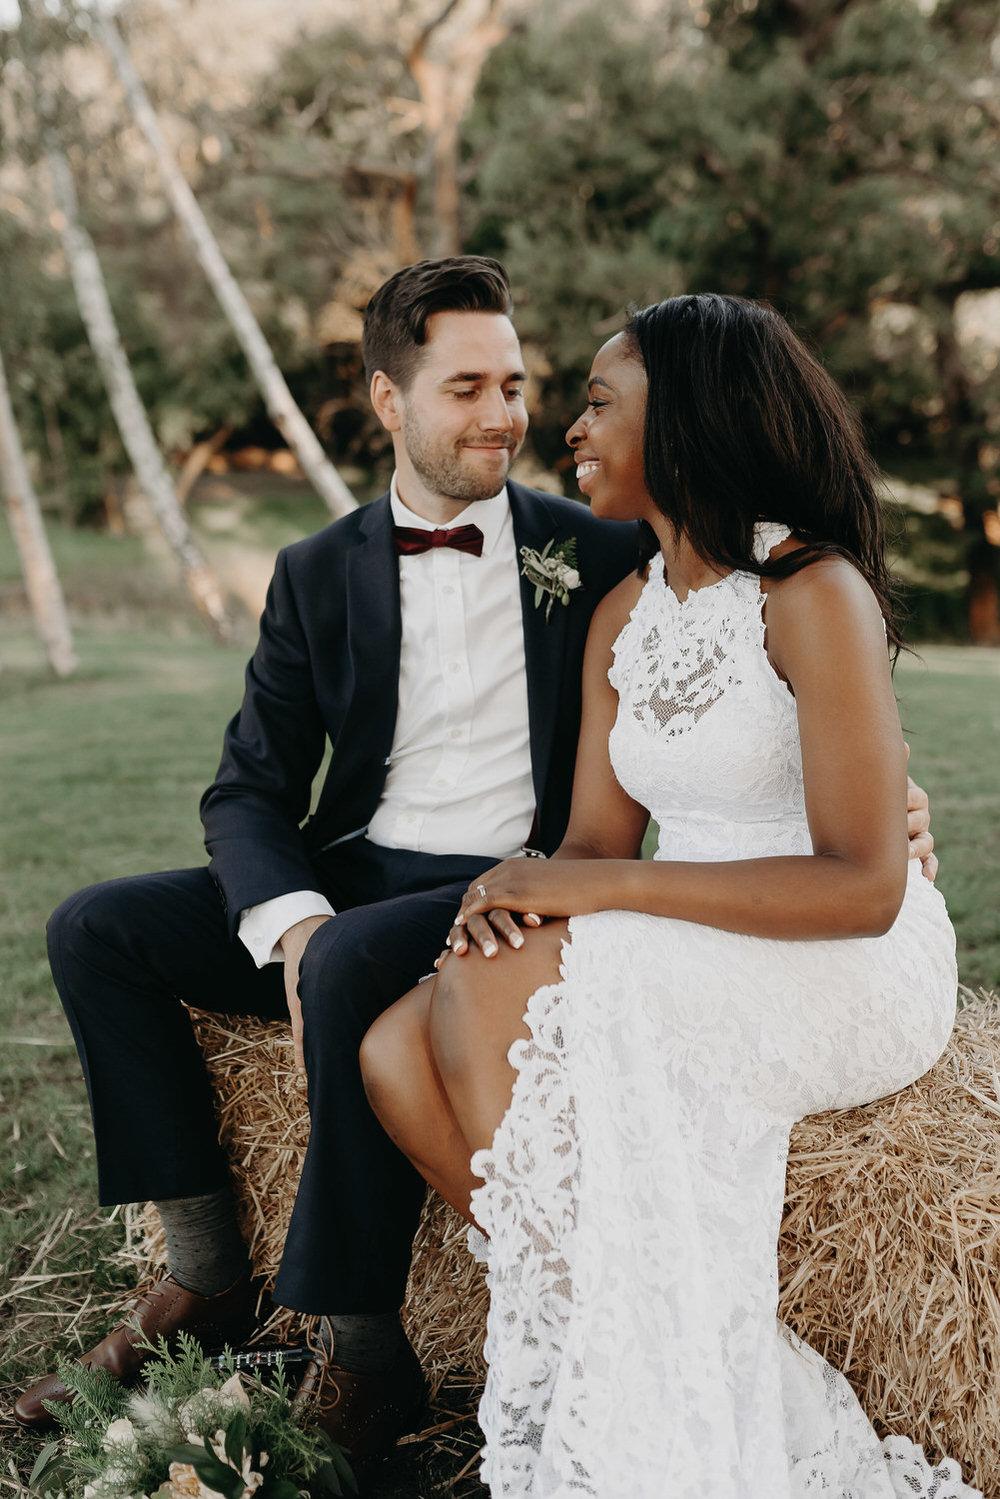 wedding-photographer-brook-farm-cuffley-12.jpg